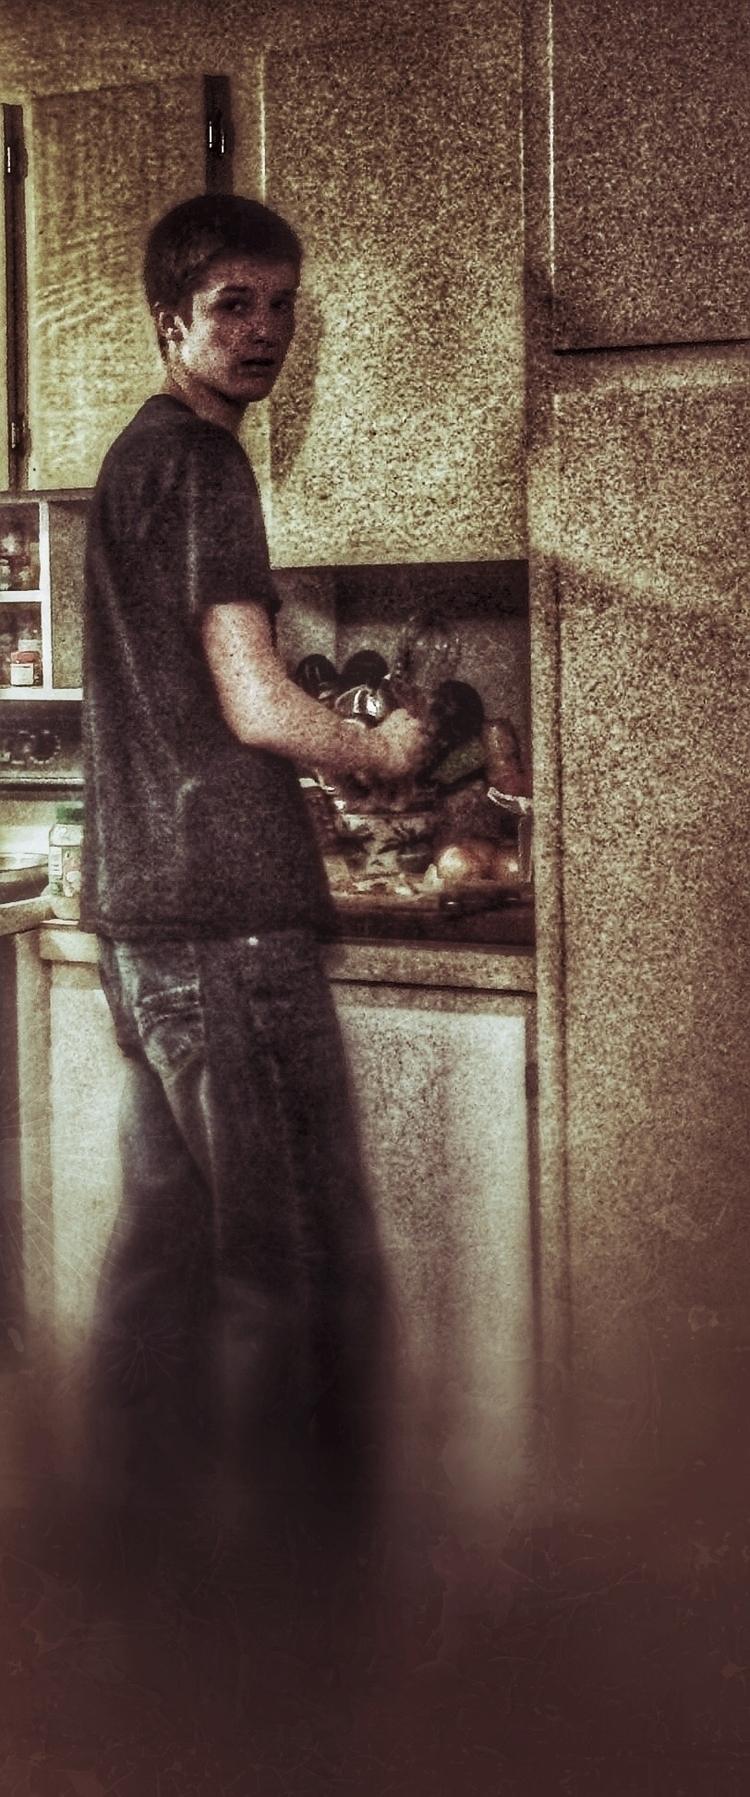 Culinary master - chandra03 | ello